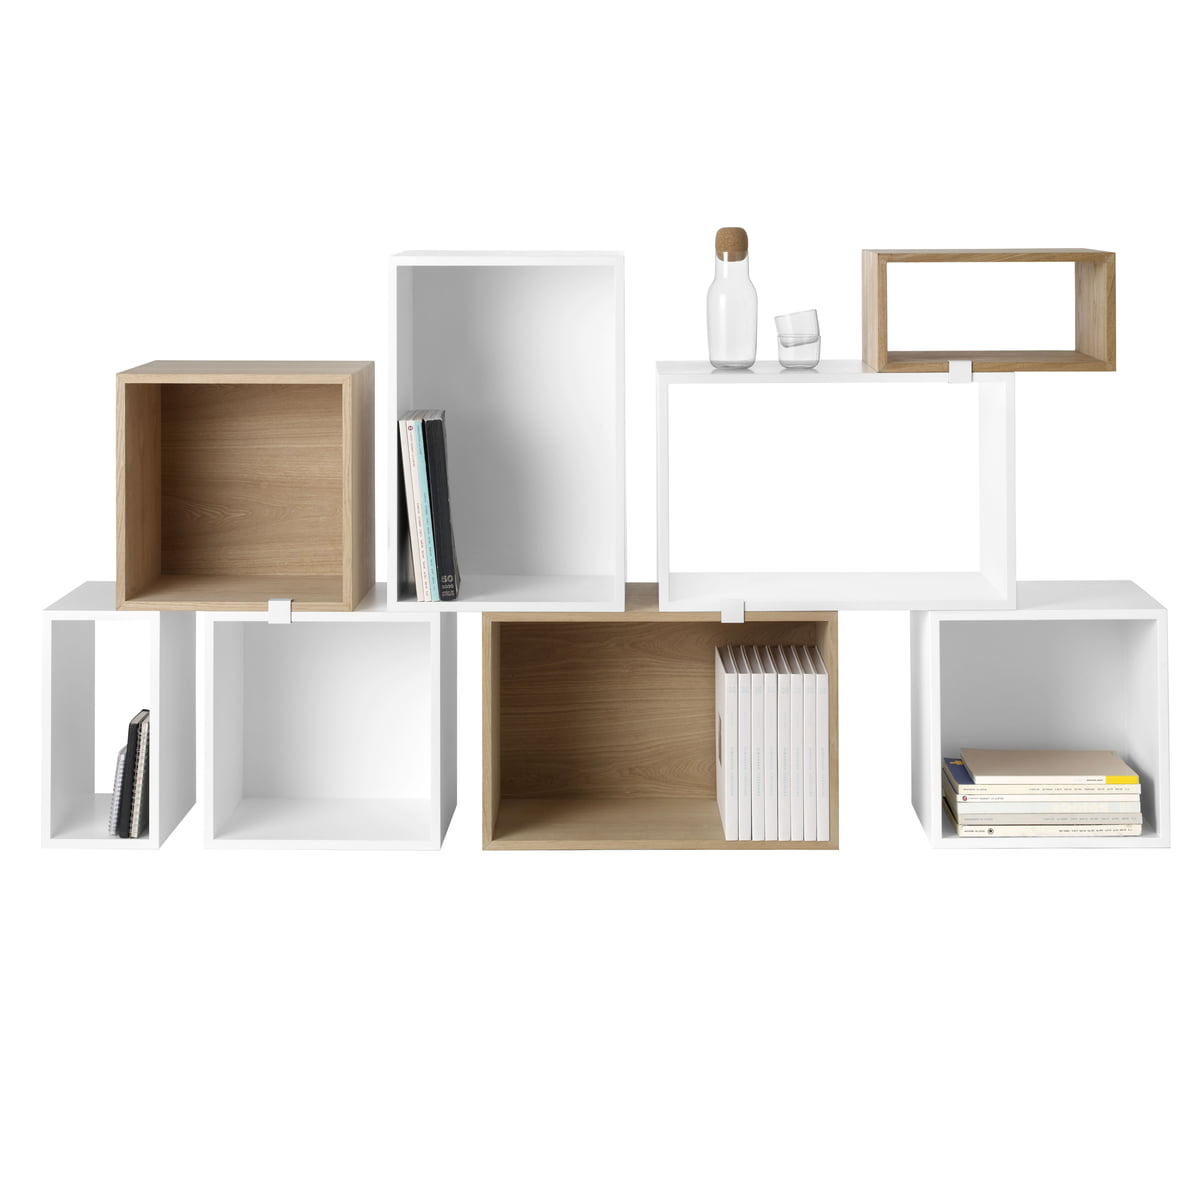 stacked regalsystem wei muuto shop. Black Bedroom Furniture Sets. Home Design Ideas